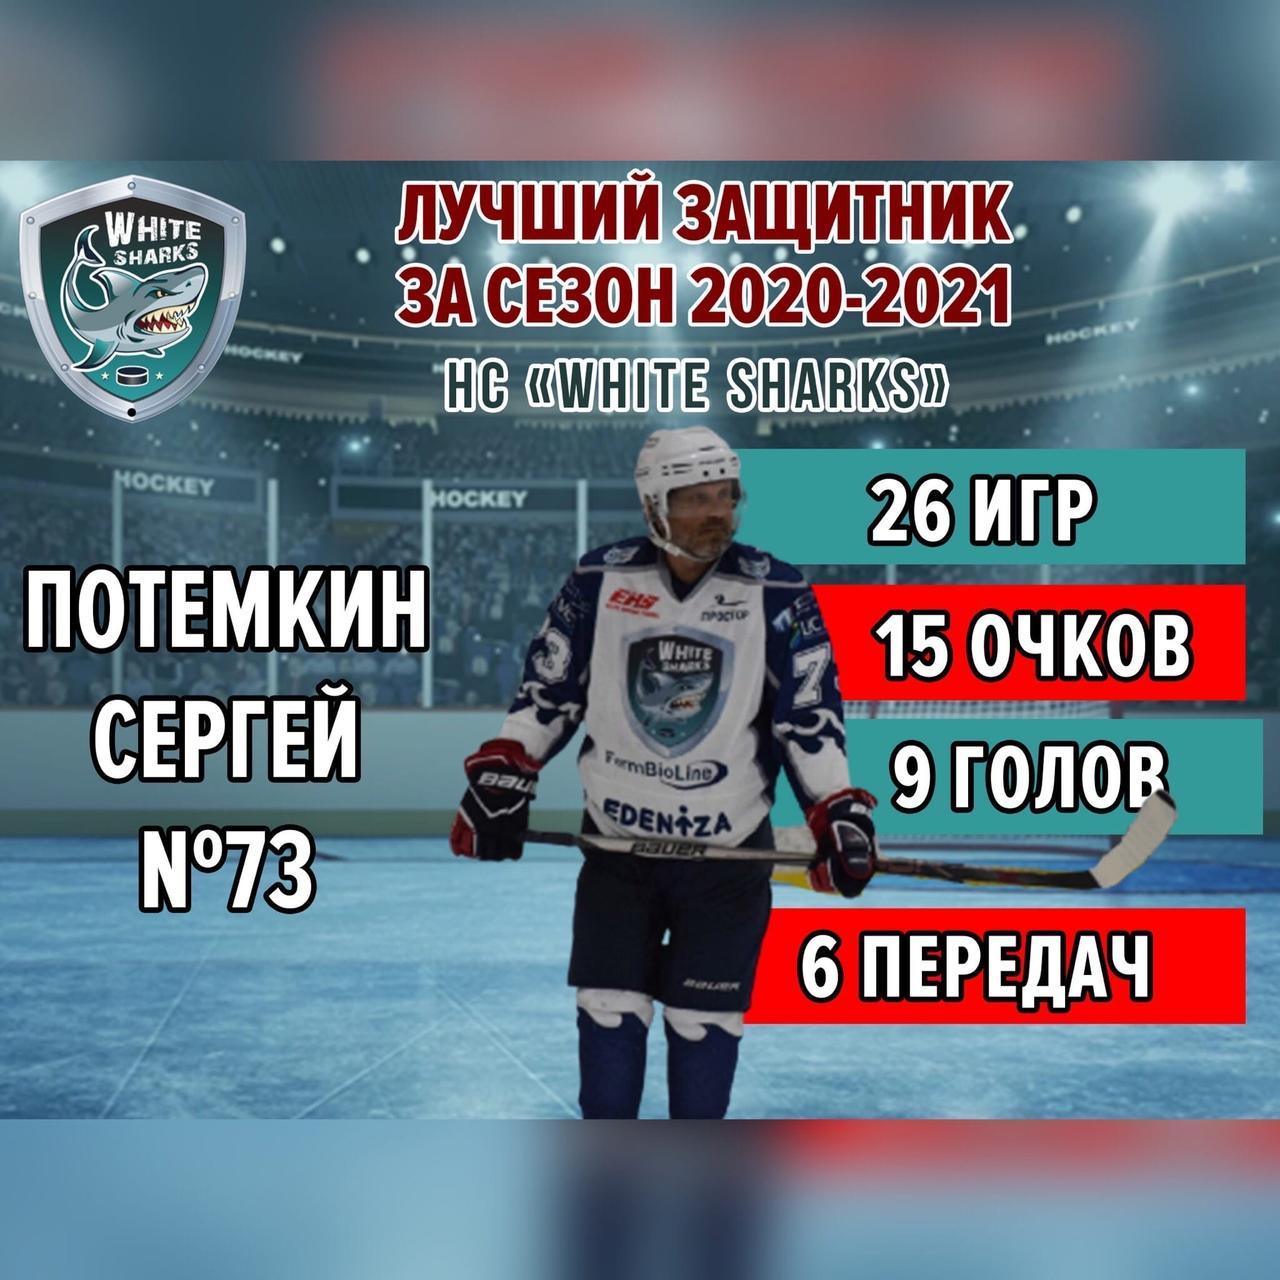 Лучшие защитник White Sharks сезон 2020/21